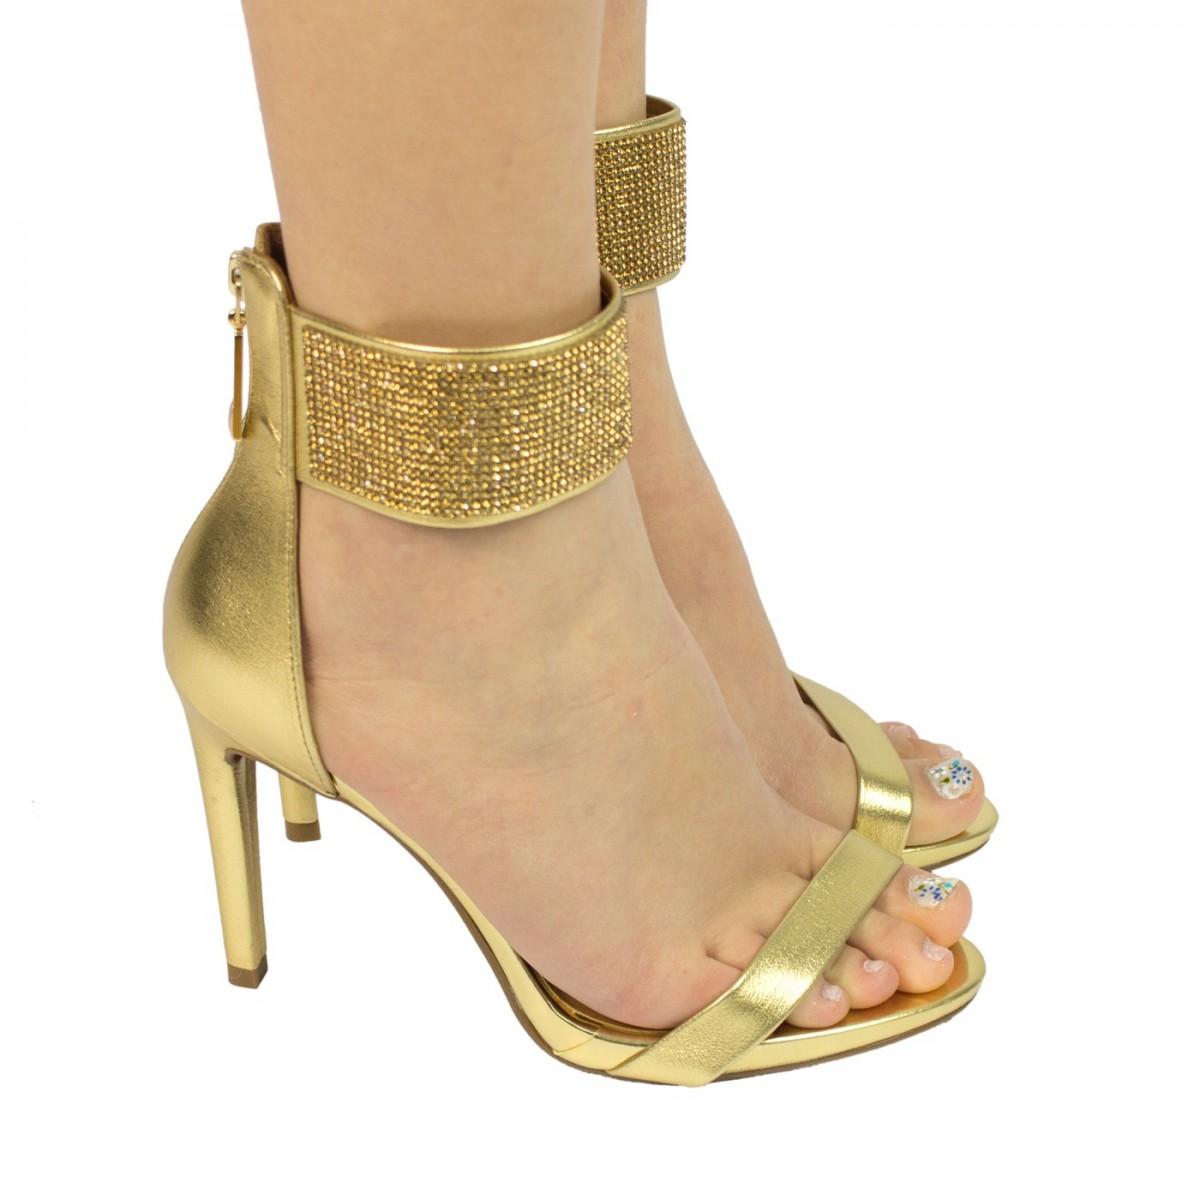 6a2dd4ba15 Bizz Store - Sandália Feminina Vizzano Salto Alto Dourada Glamour